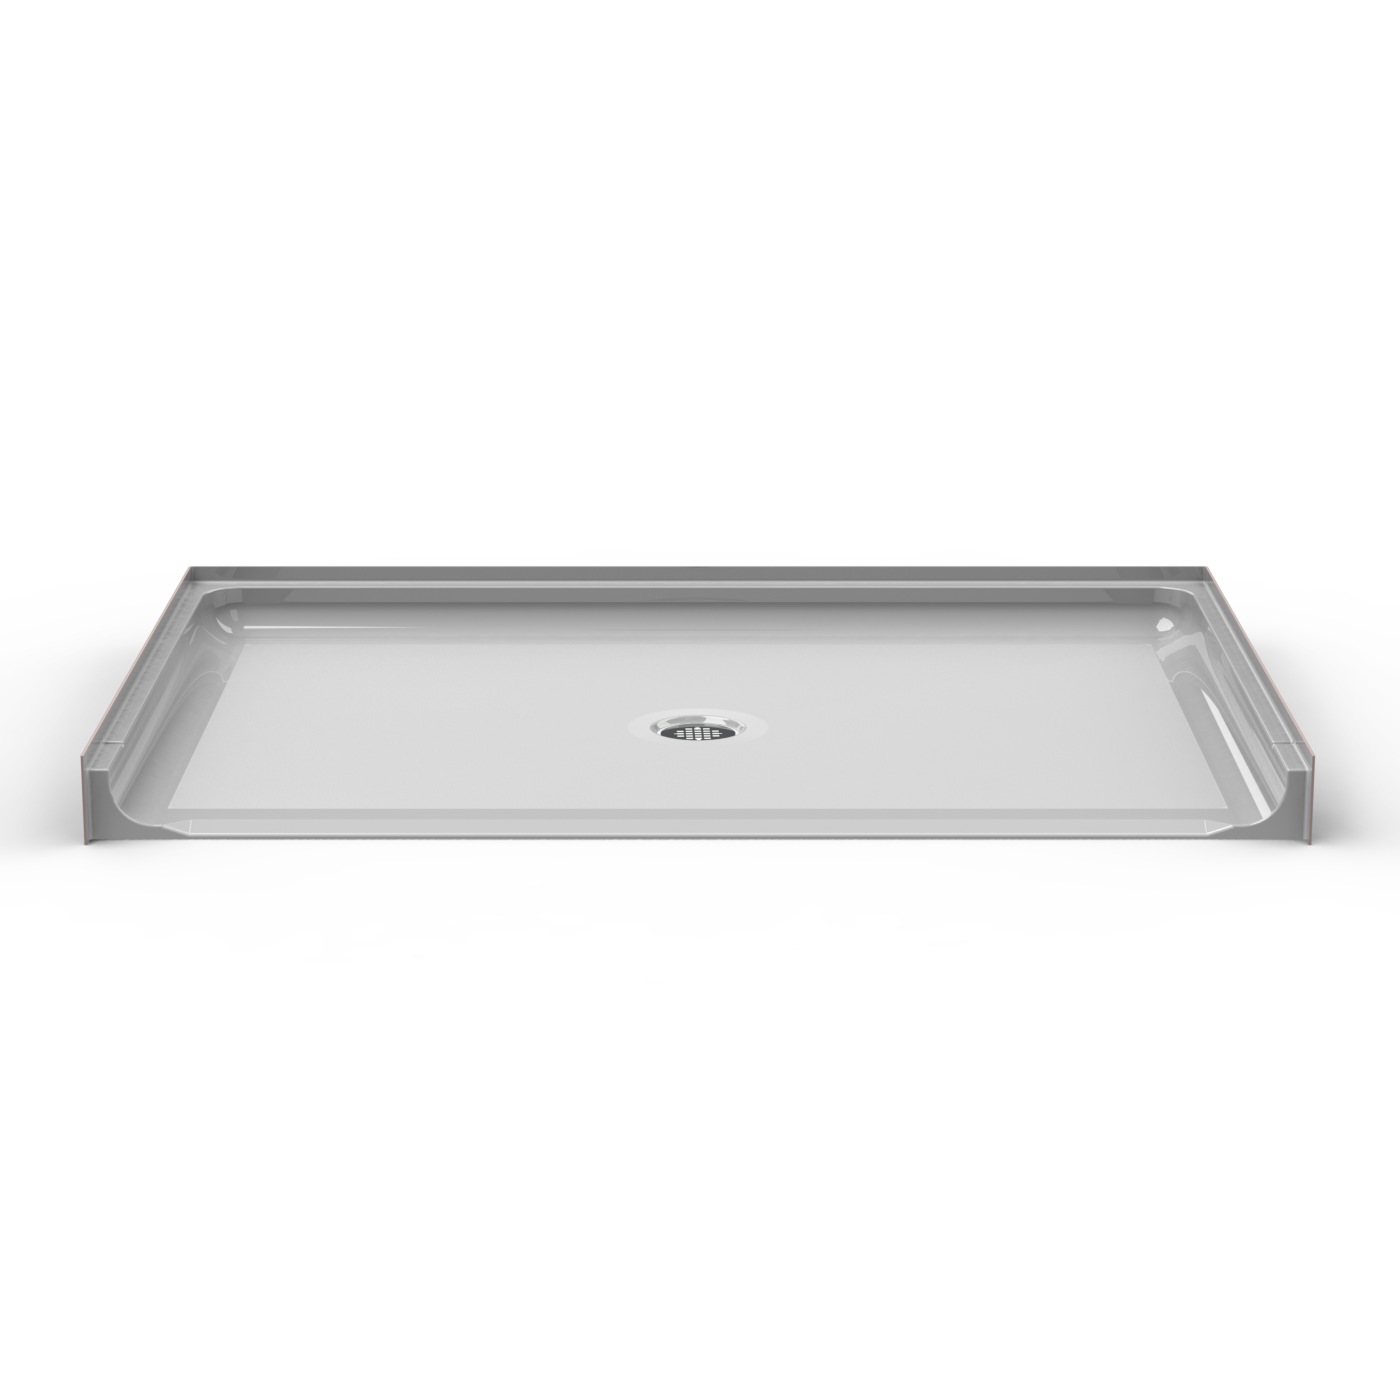 ada roll in shower pan seamless 63x42 best bath showroom. Black Bedroom Furniture Sets. Home Design Ideas